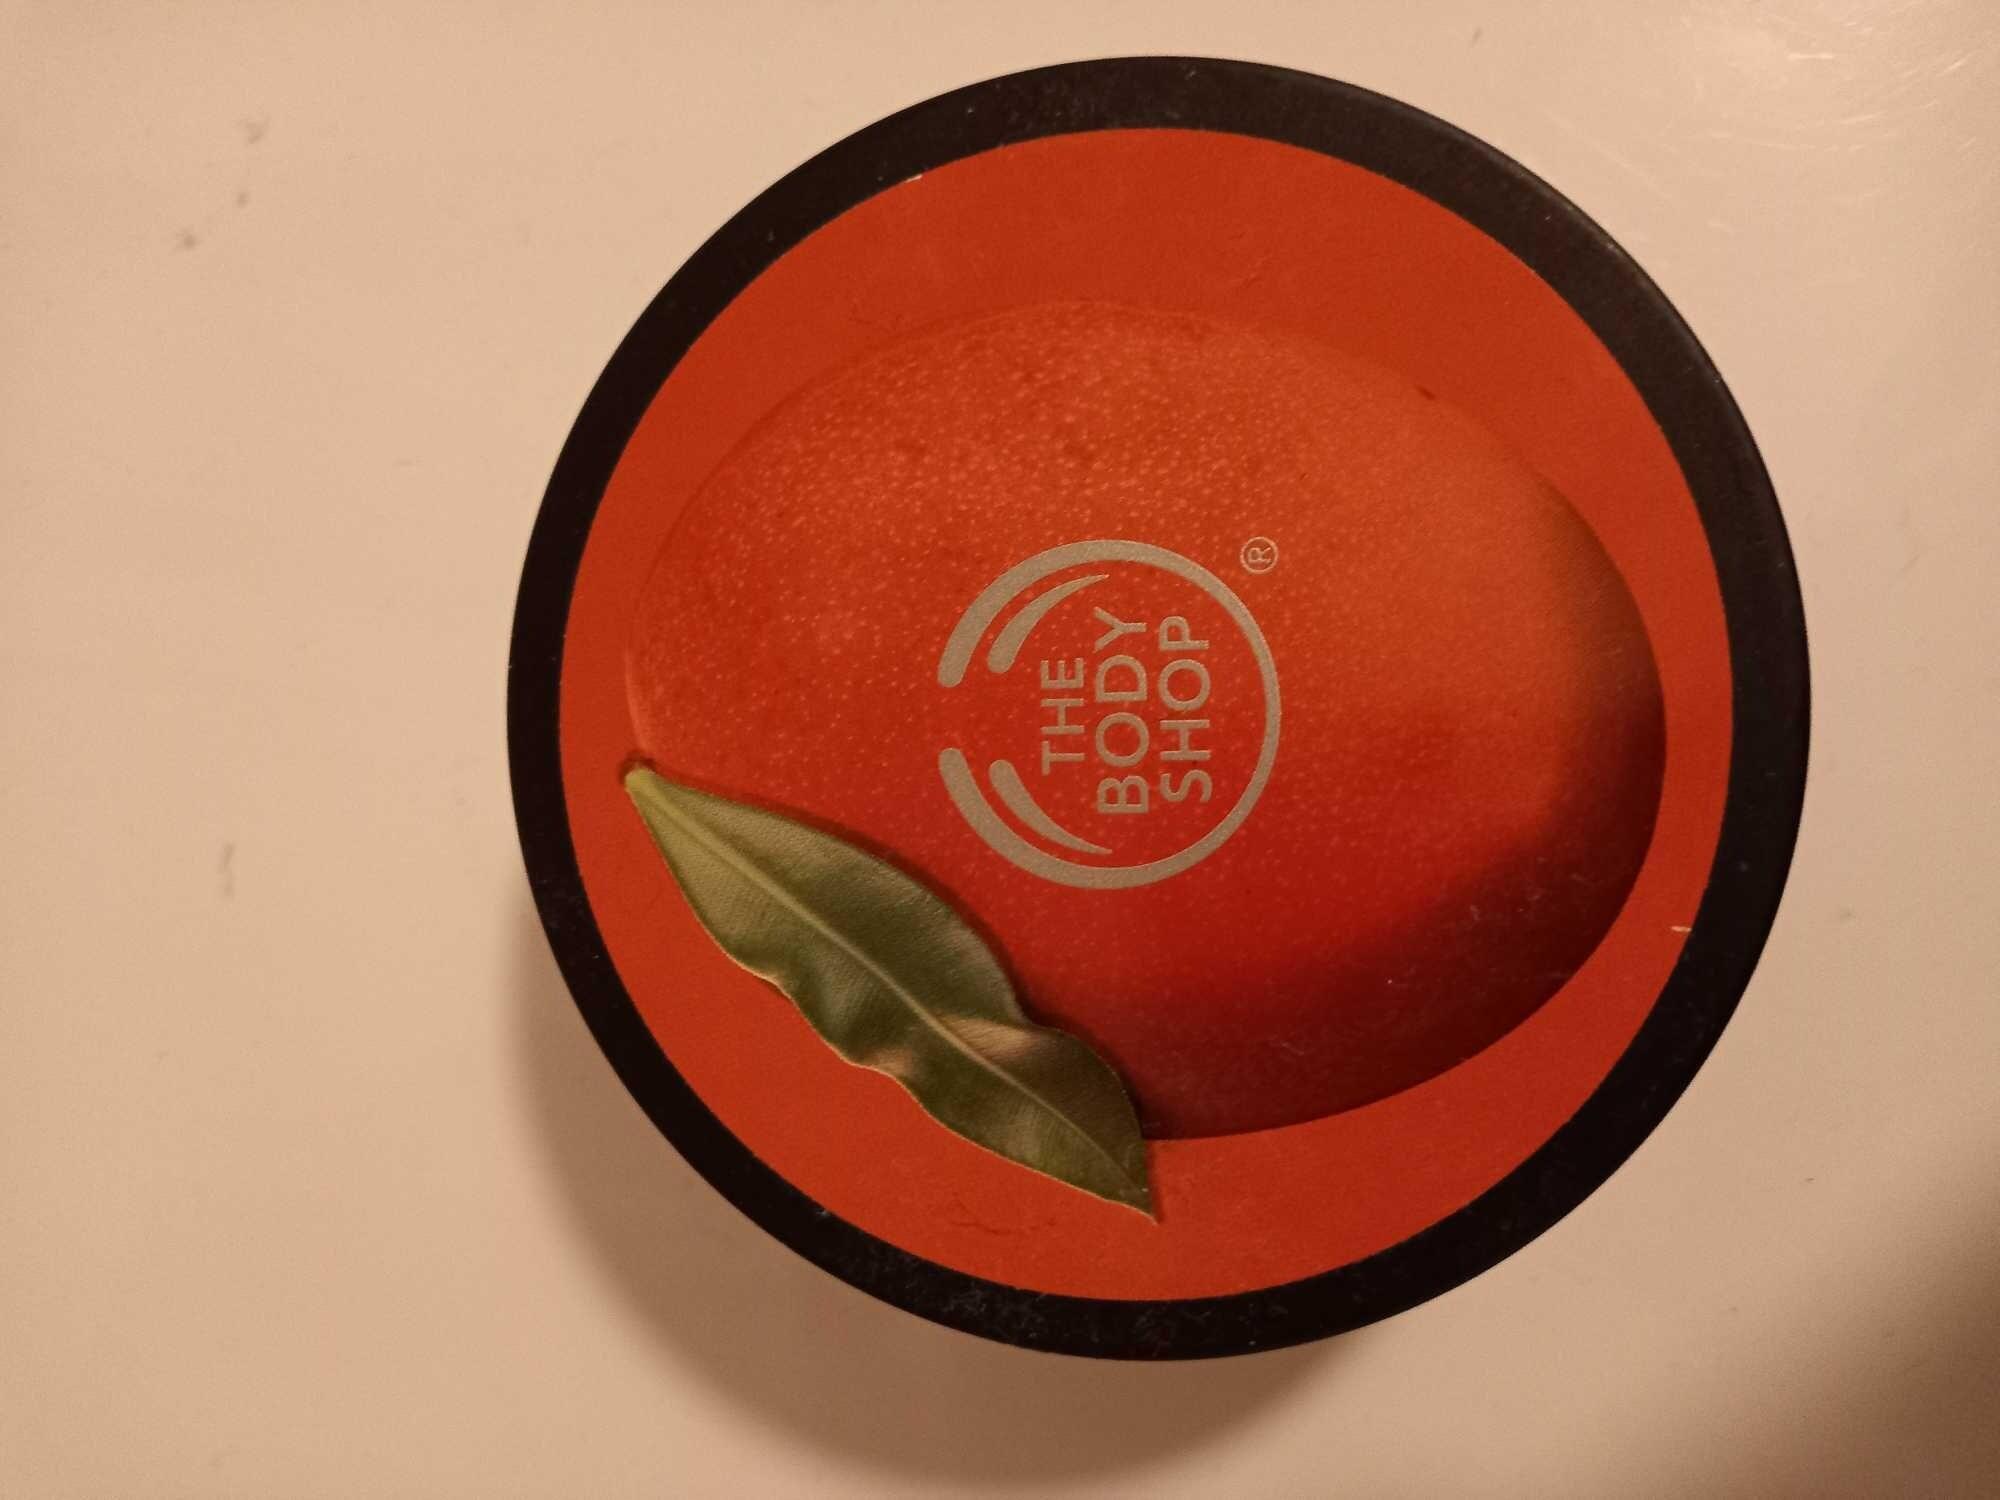 Beurre corps a la mangue - Product - fr